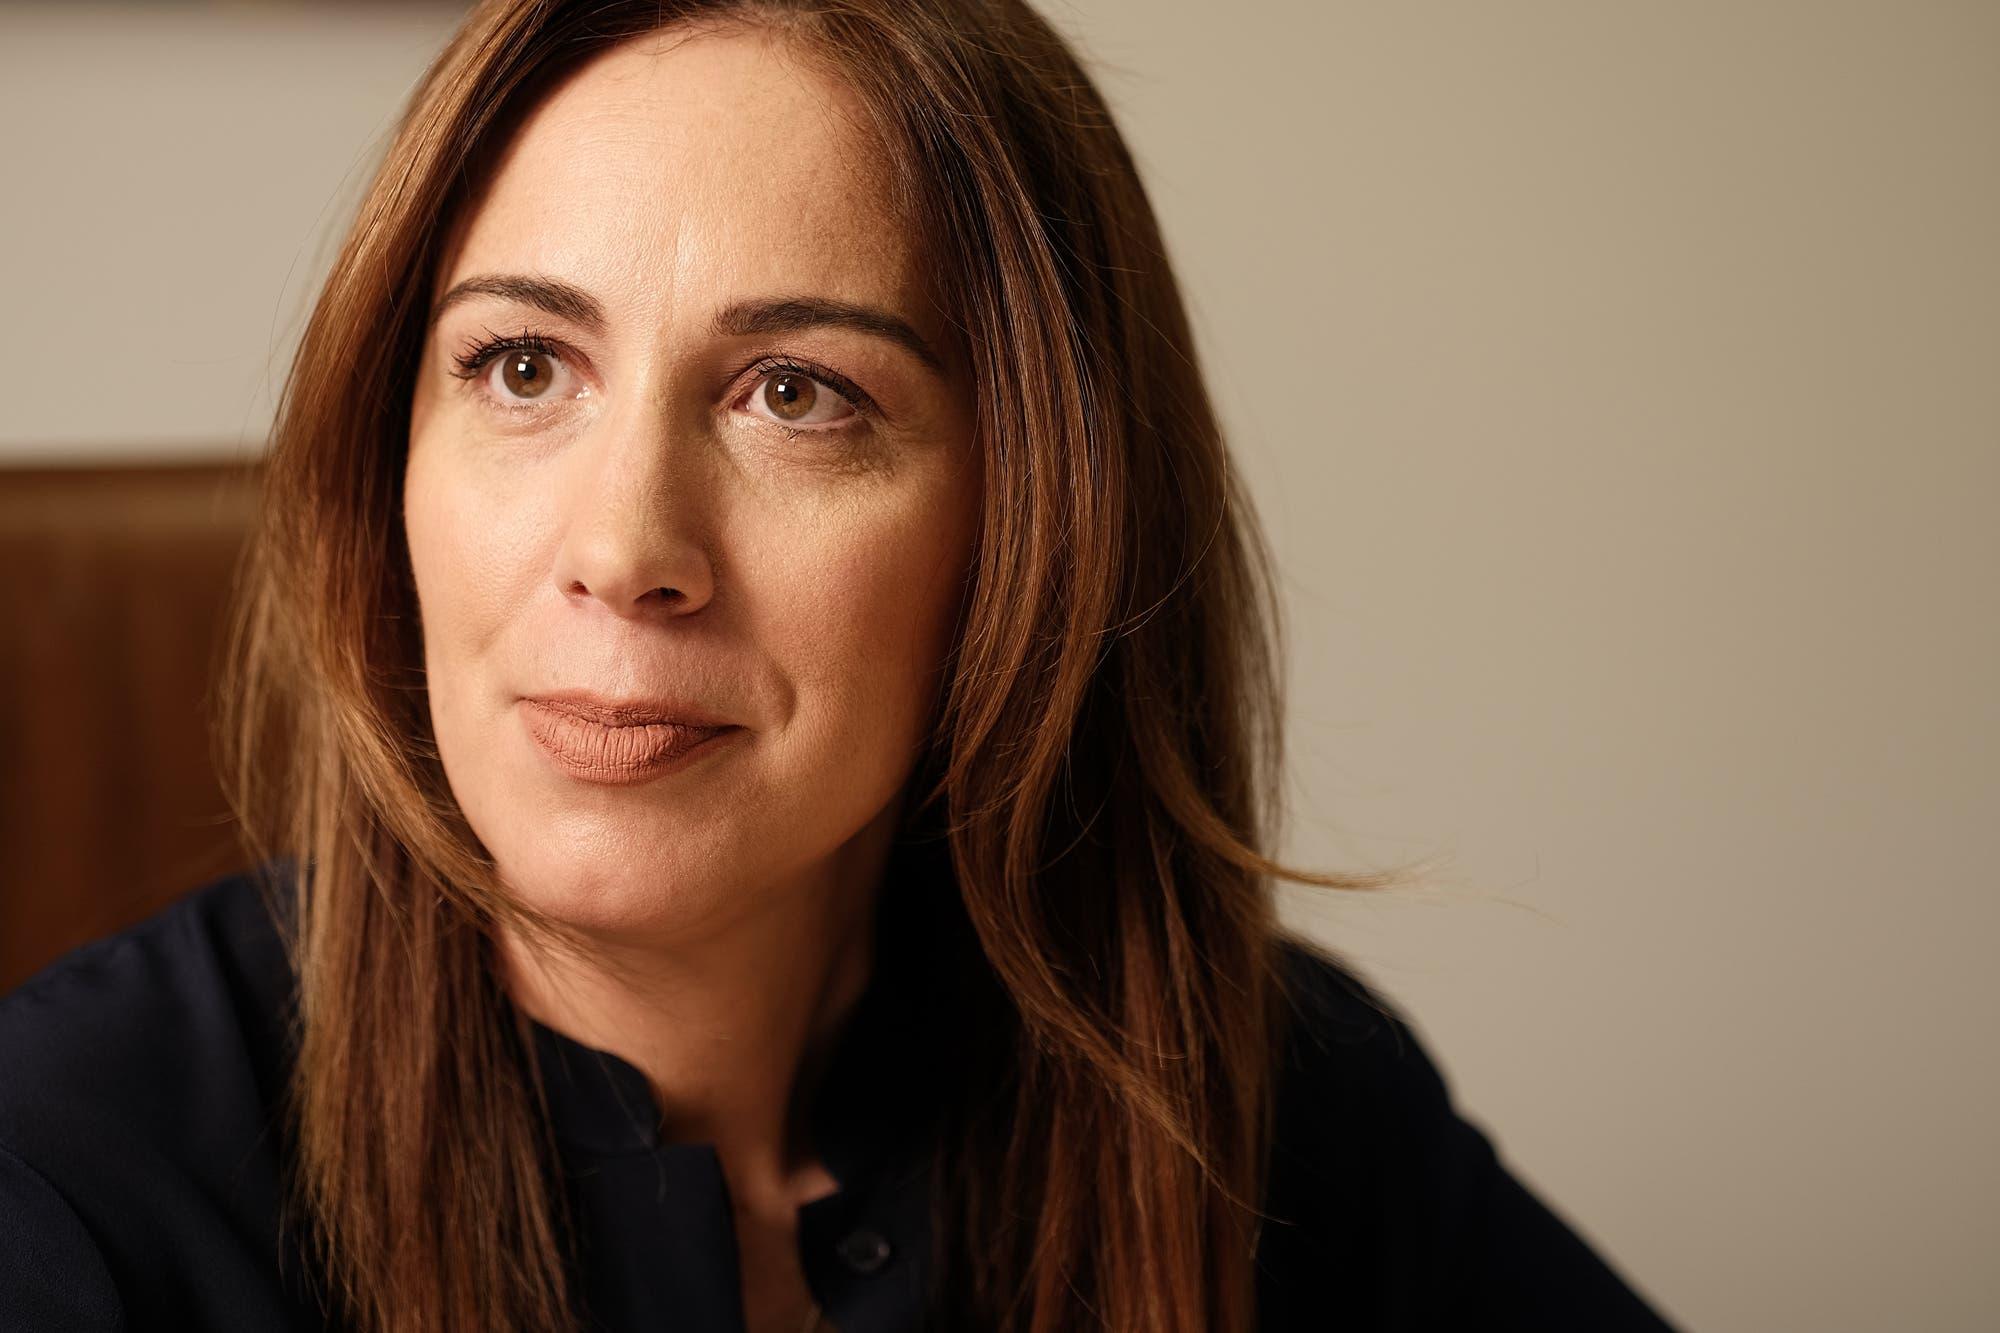 María Eugenia Vidal pasará Año Nuevo en Europa junto a Quique Sacco